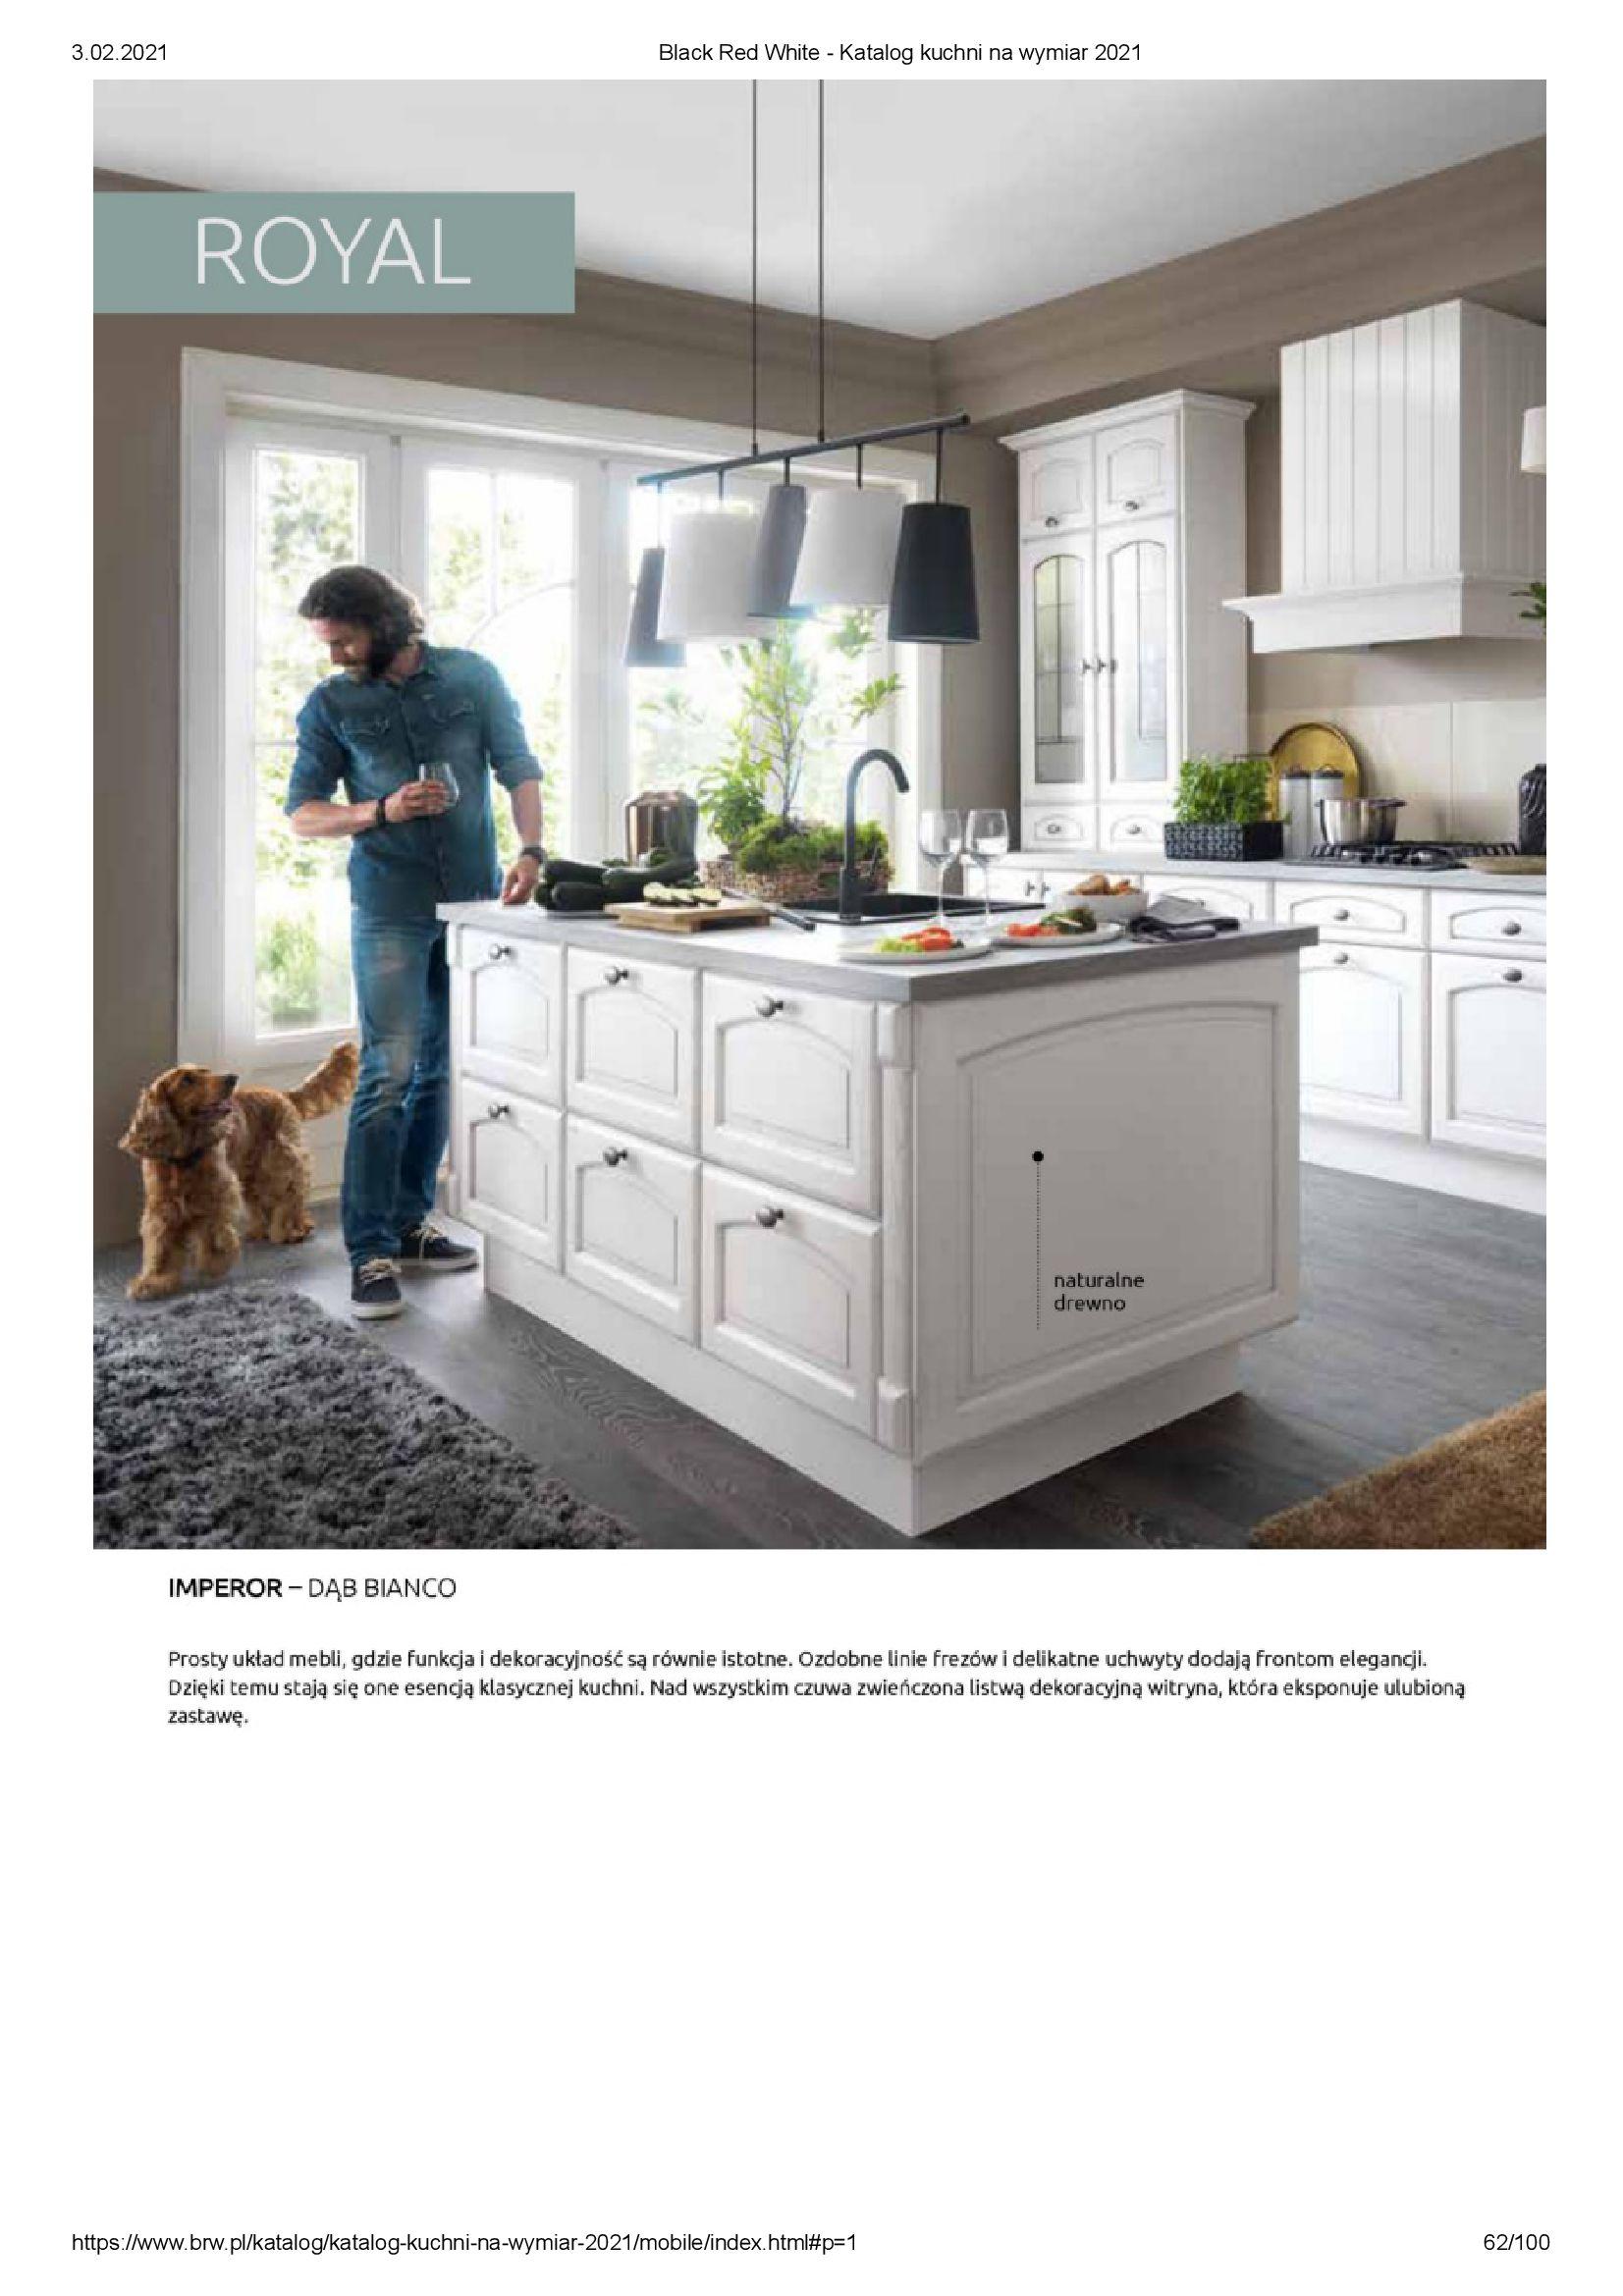 Gazetka Black Red White: Katalog - Kuchnie na wymiar Senso Kitchens 2021 2021-01-01 page-62